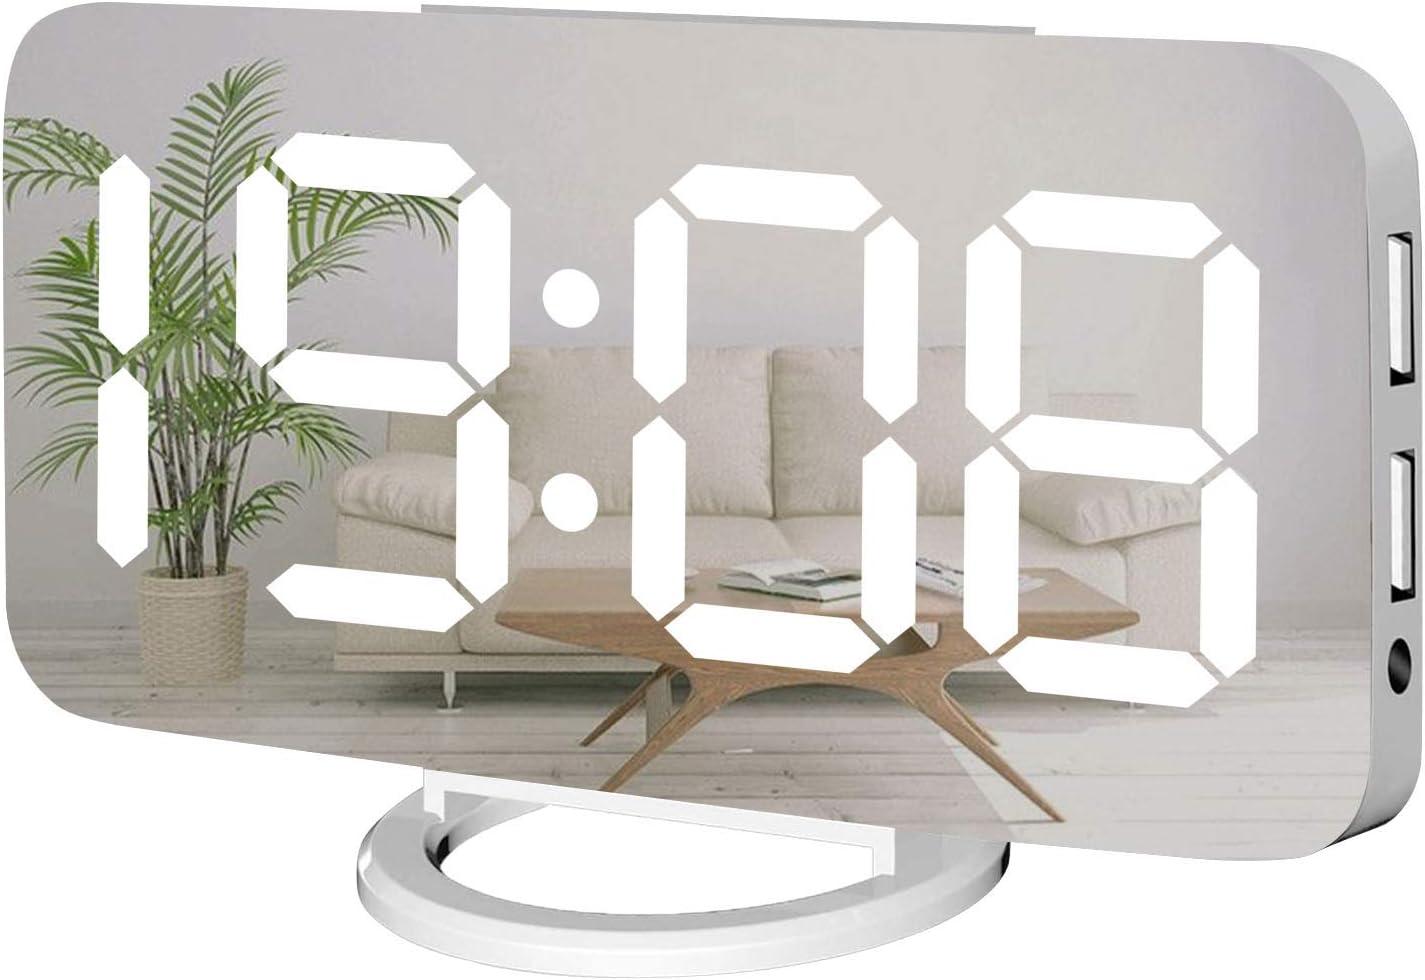 Miowachi Digital Alarm Clock,Large Mirrored LED Clock,Snooze,Dim Night Light 2 USB Charger Ports Desk Alarm Clocks for Bedroom Decor (White)